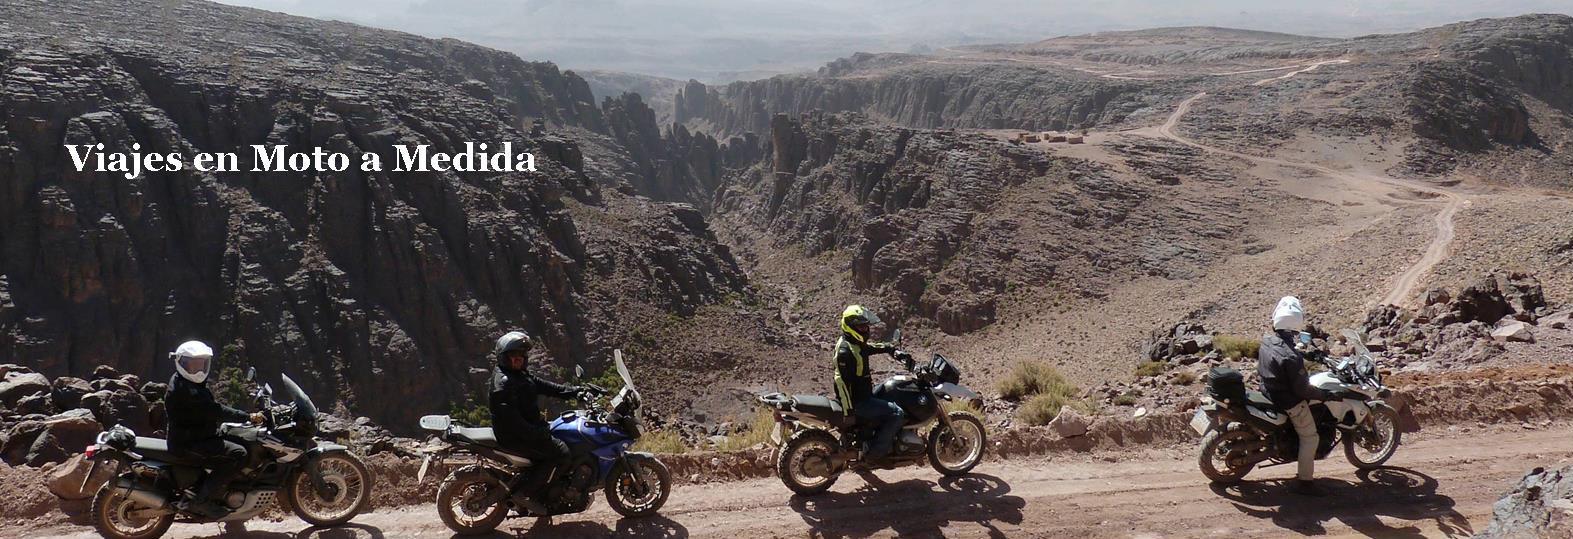 Viajes en moto a medida. Descubre Marruecos